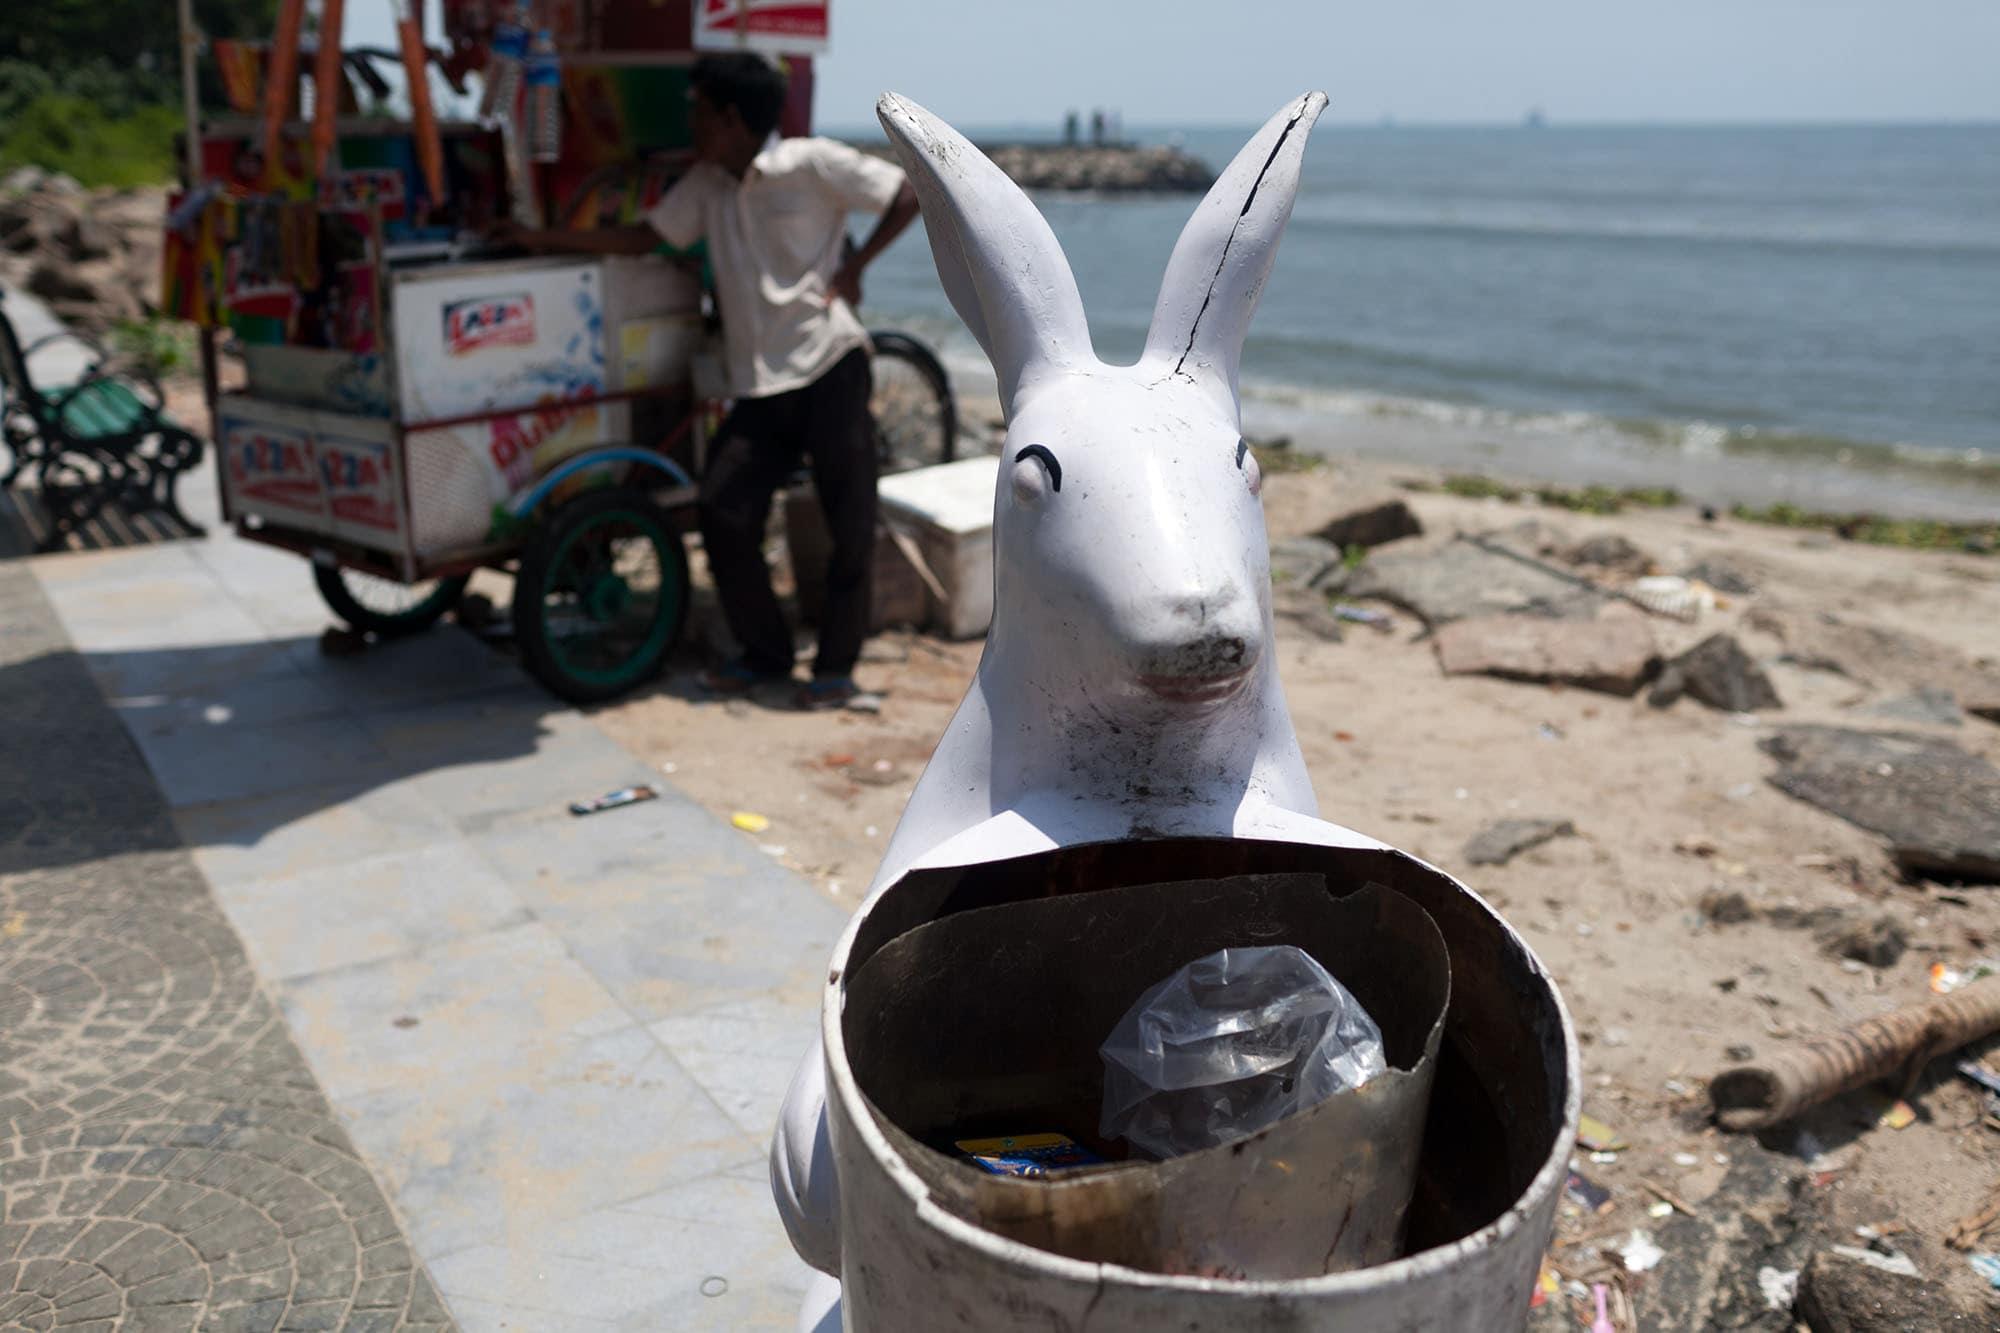 Rabbit shaped trash can in Fort Kochi, India (Cochin) in Kerala.